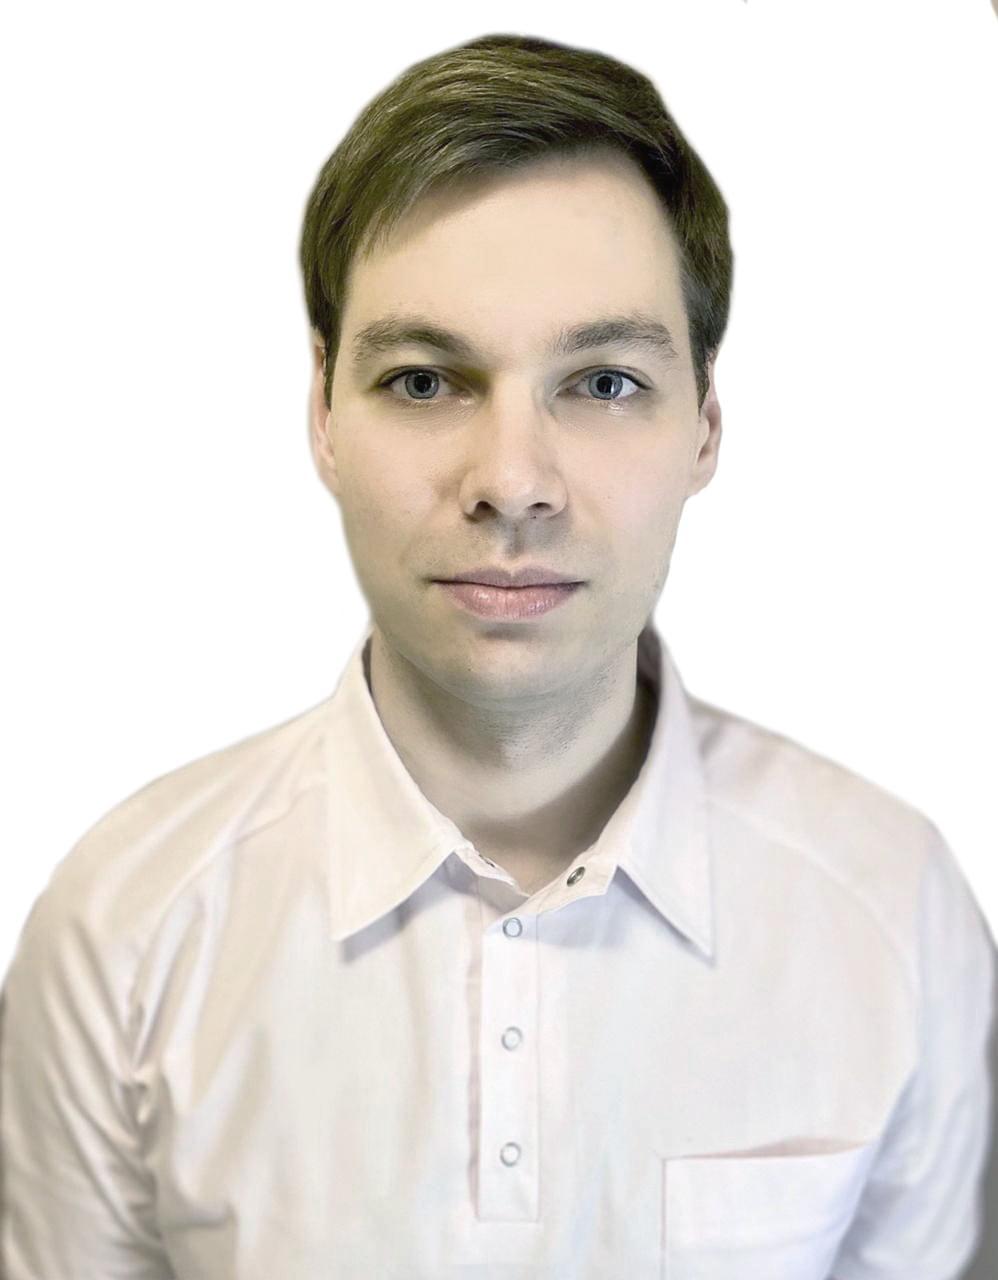 Кокоркин Евгений Олегович : Врач стоматолог –ортопед